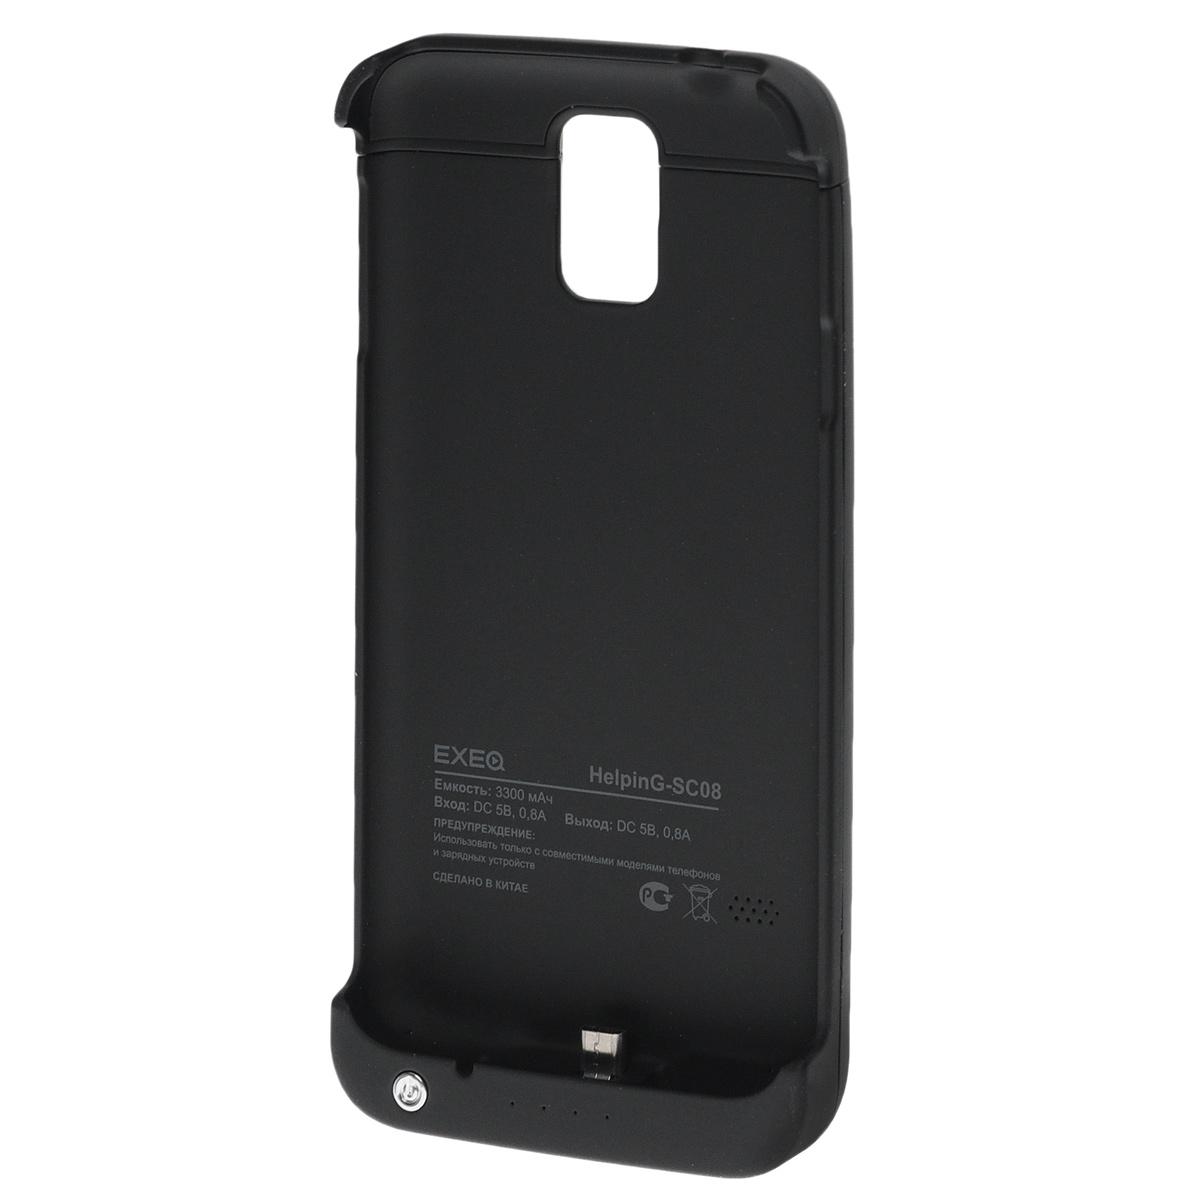 все цены на EXEQ HelpinG-SC08 чехол-аккумулятор для Samsung Galaxy S5, Black (3300 мАч, клип-кейс) онлайн